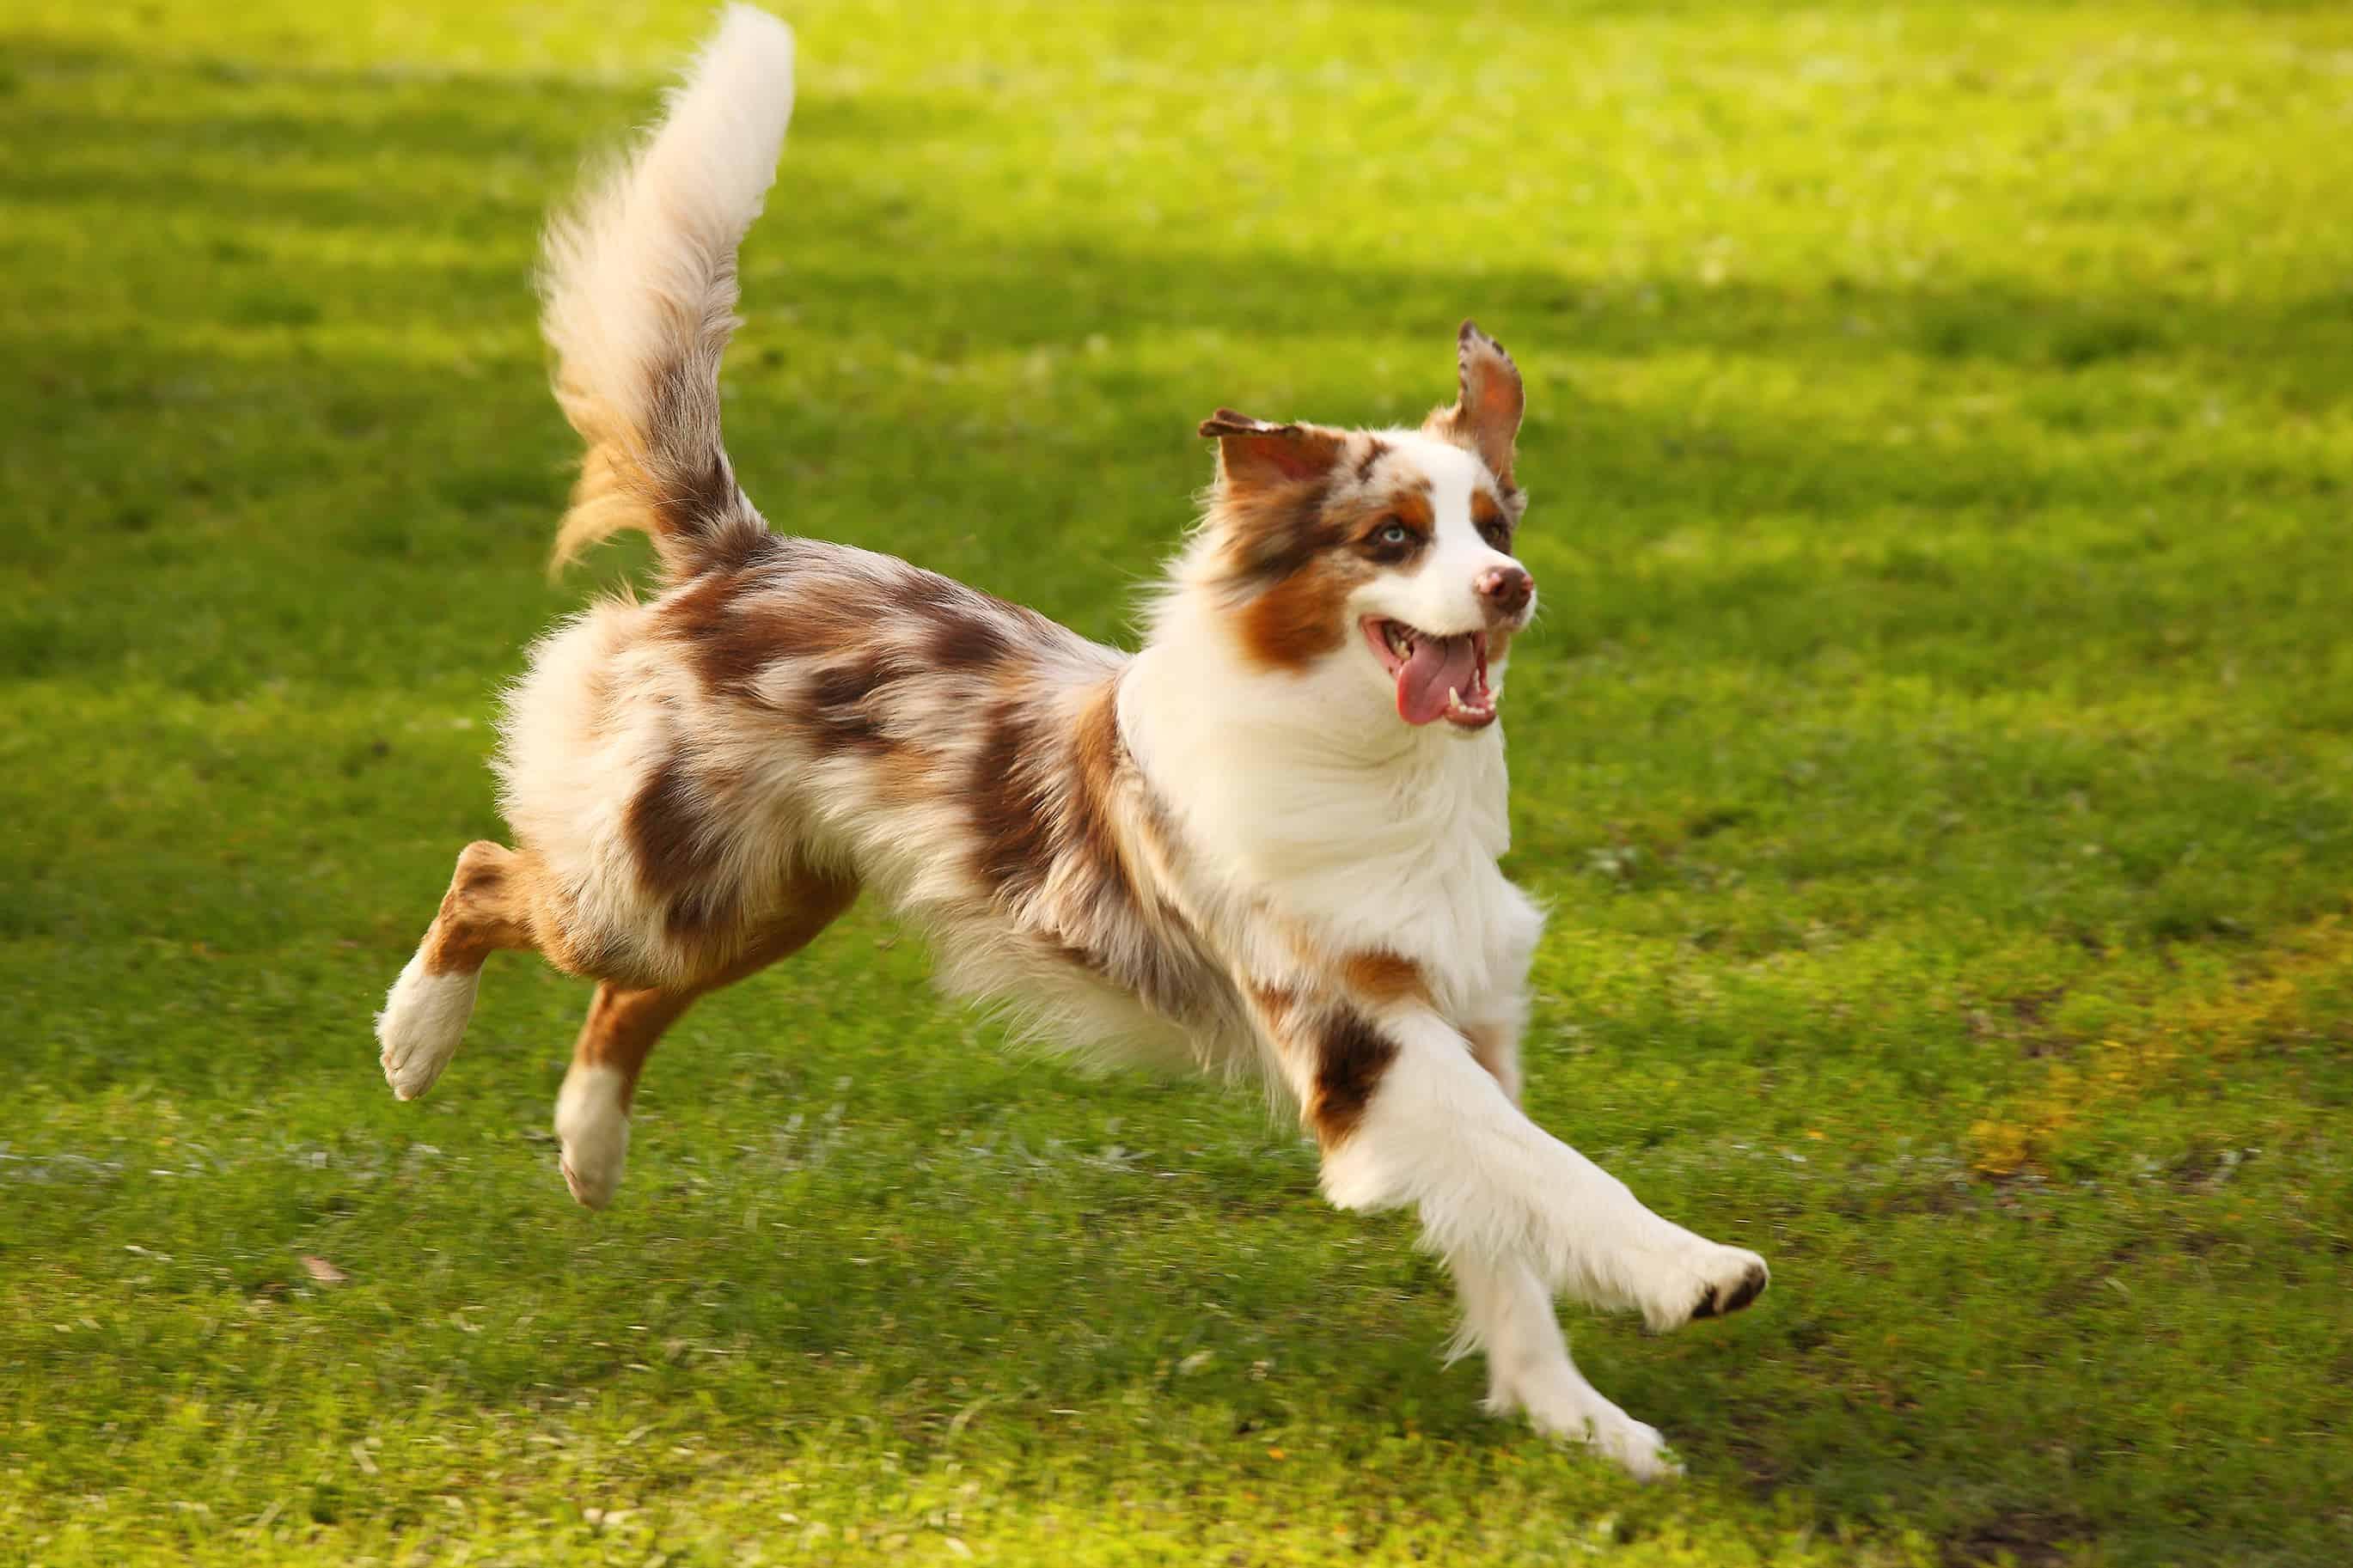 dog play – Copy